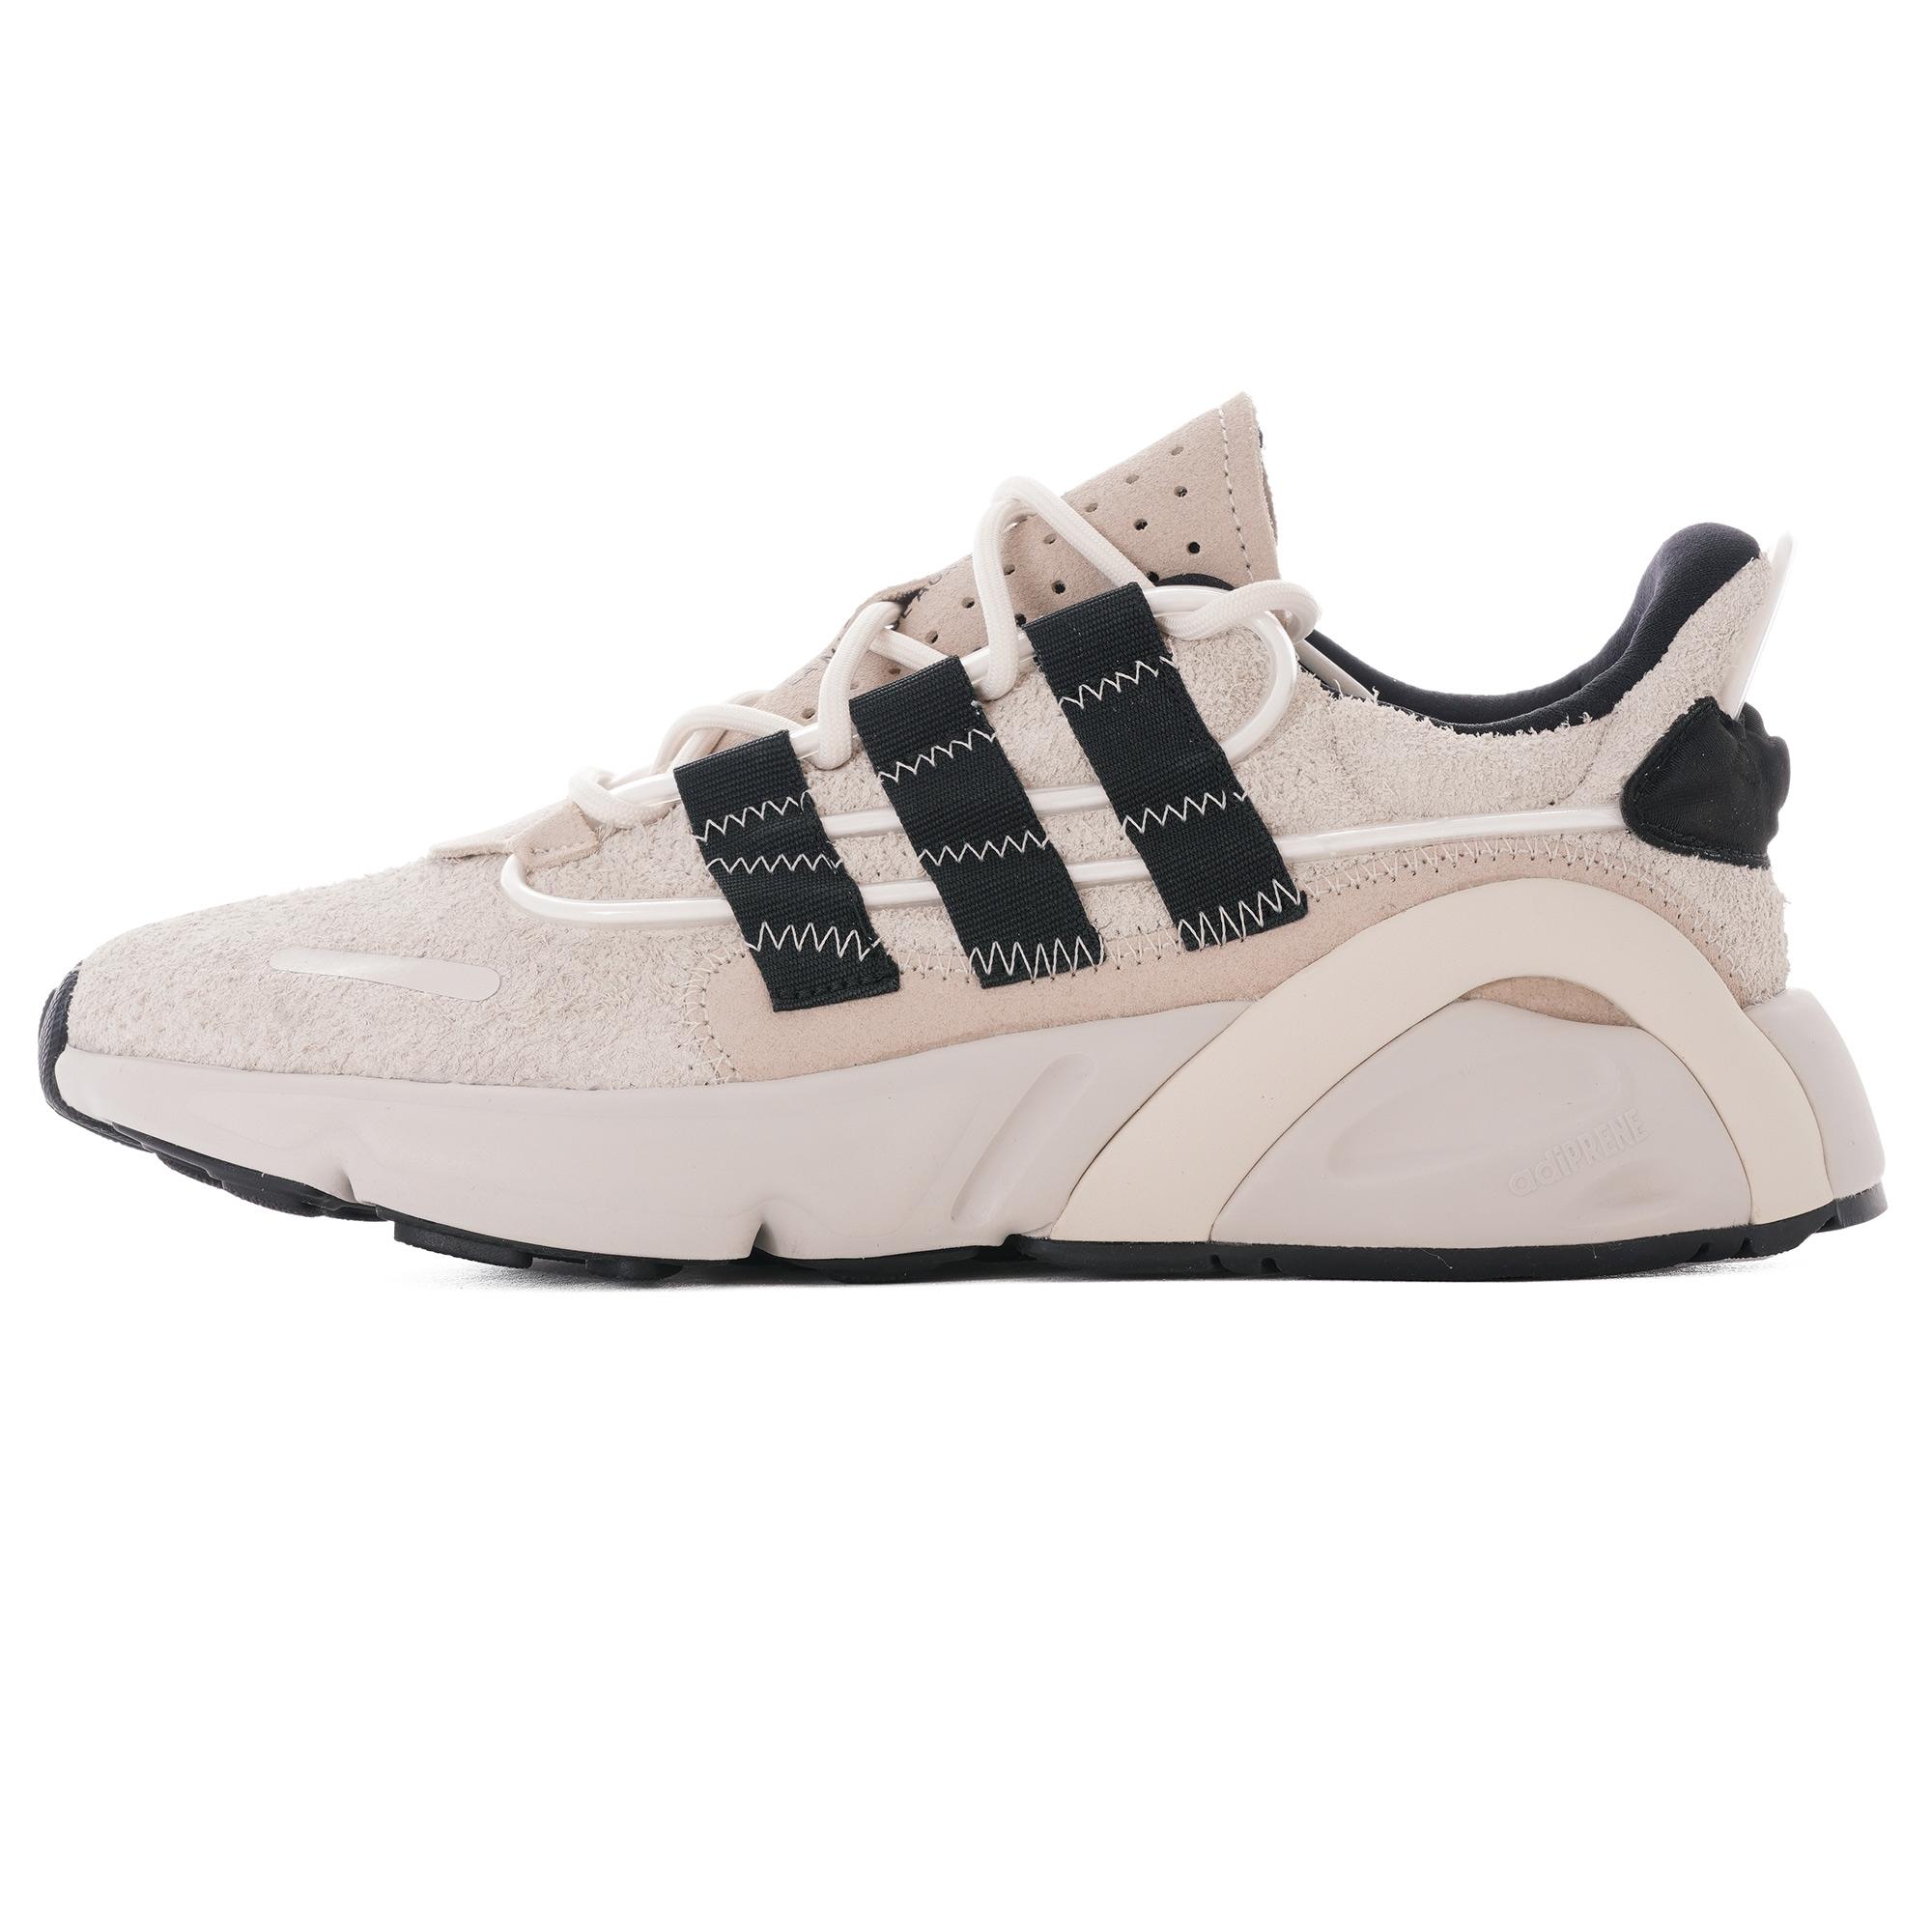 brand new Adidas trainers size 4 no box in UB7 Hillingdon